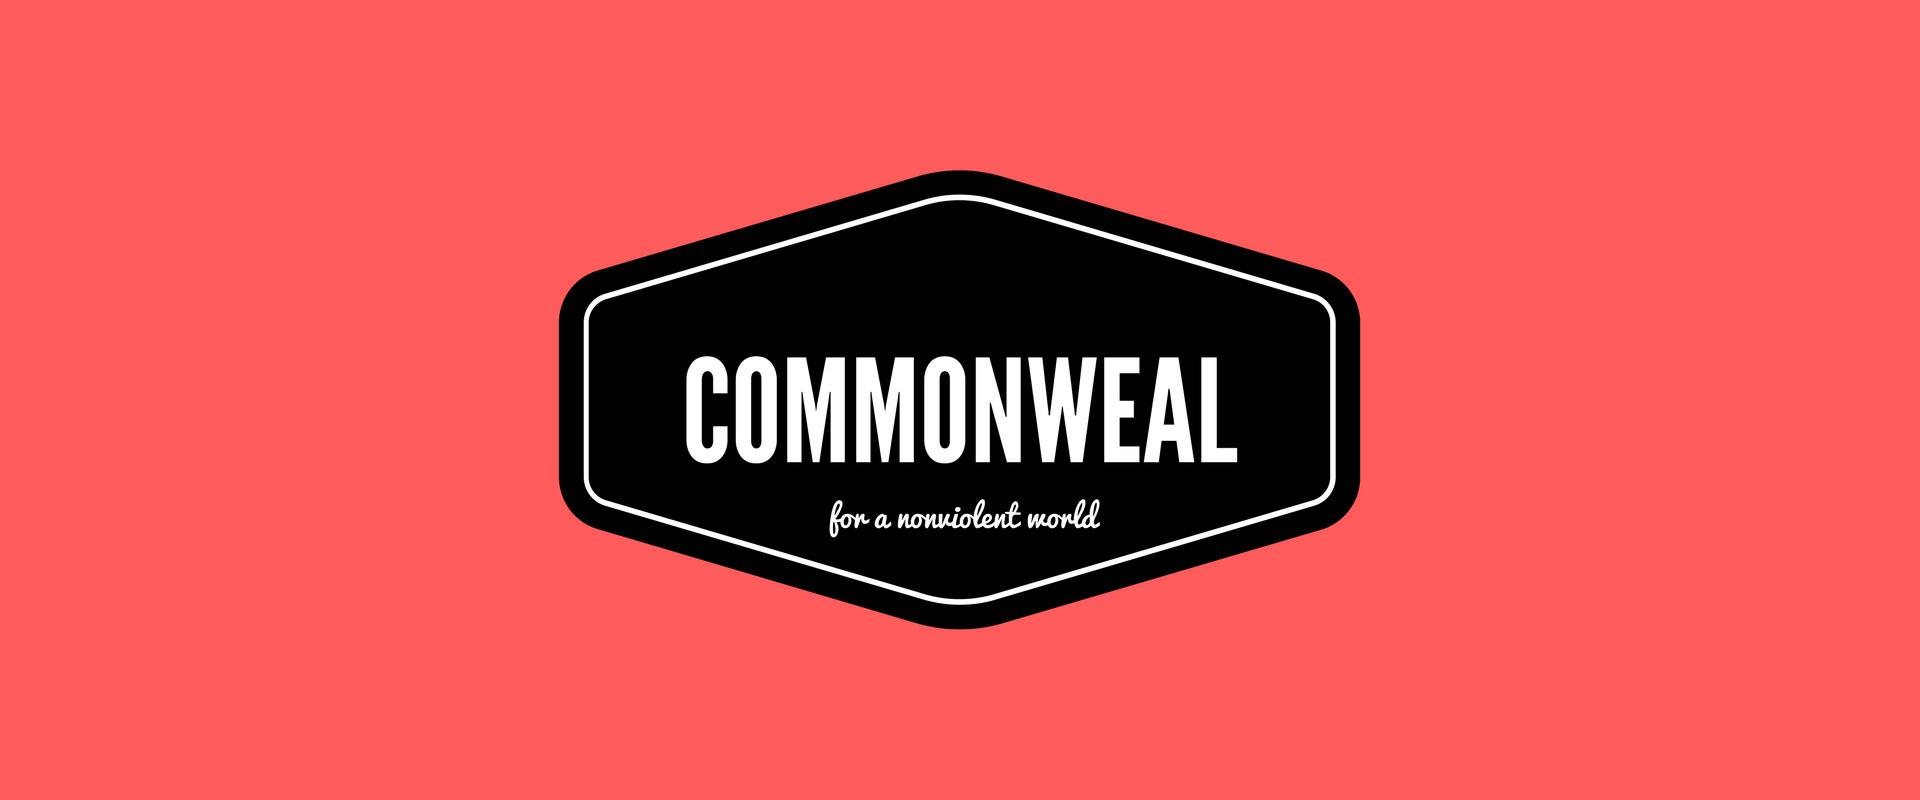 commonweal-header-image